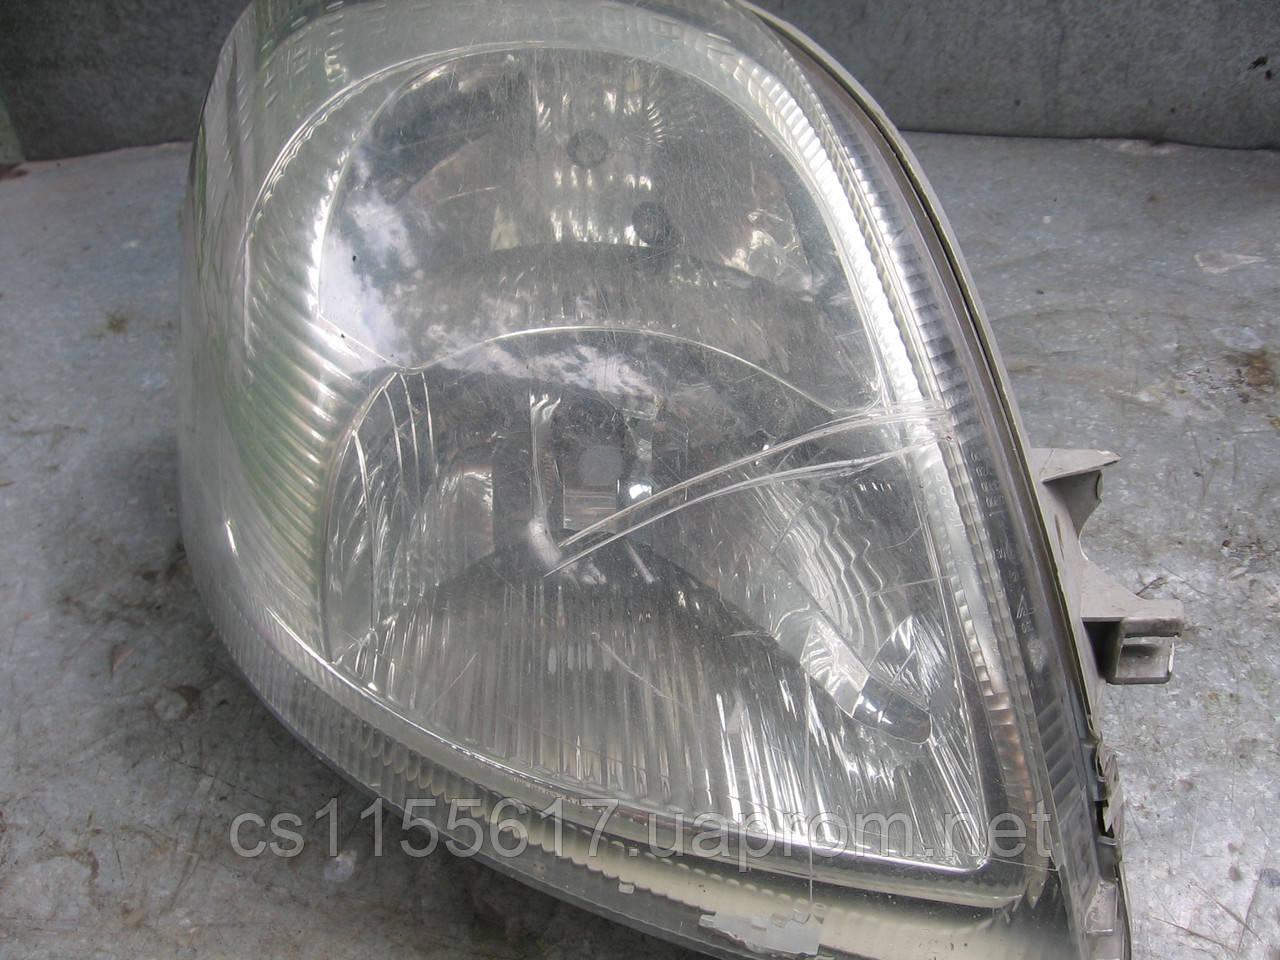 Фара правая б/у на Renault Master, Opel Movano, Nissan Intersar год 2003-2010 (царапины, нет креплений)